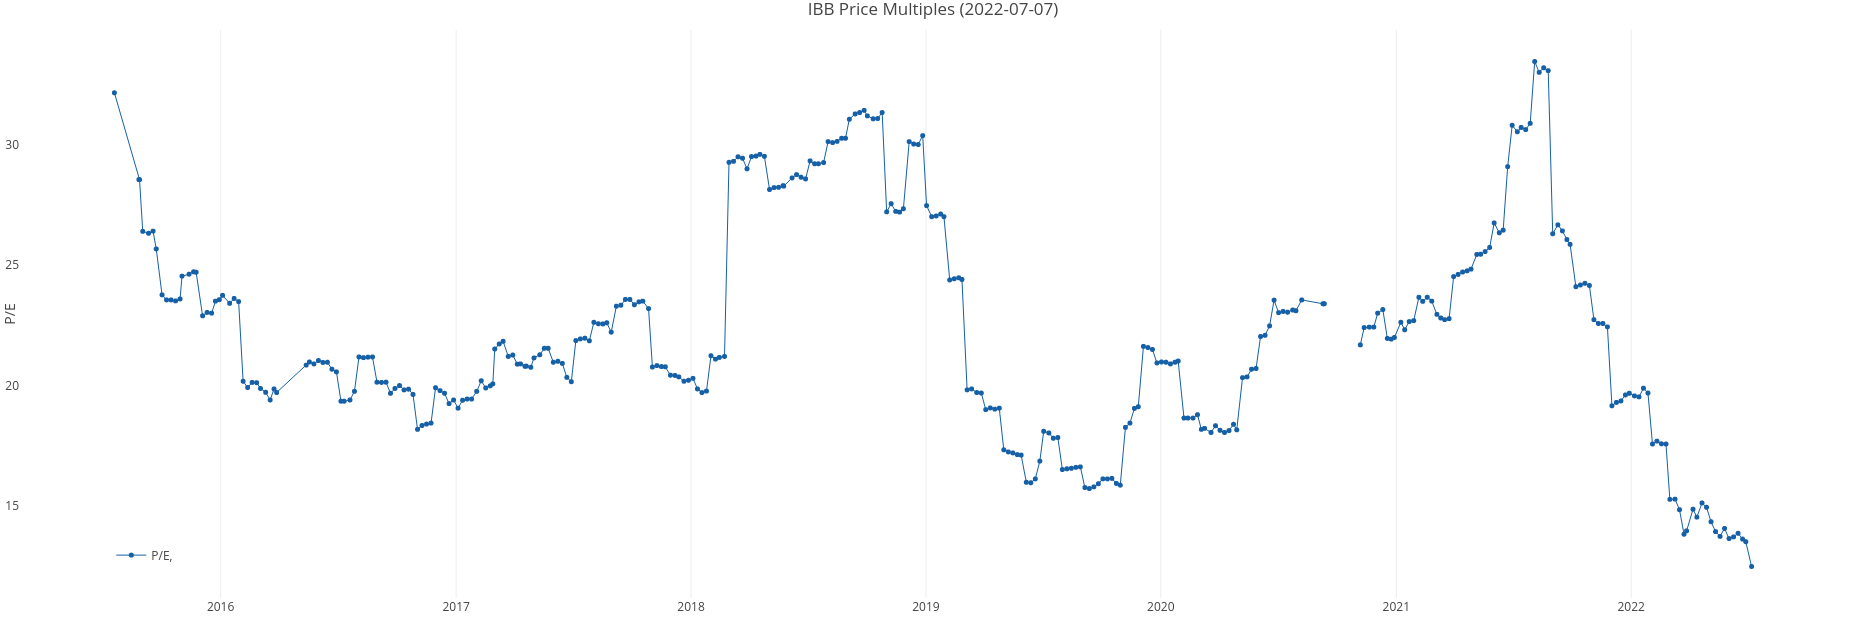 IBB Price Multiples